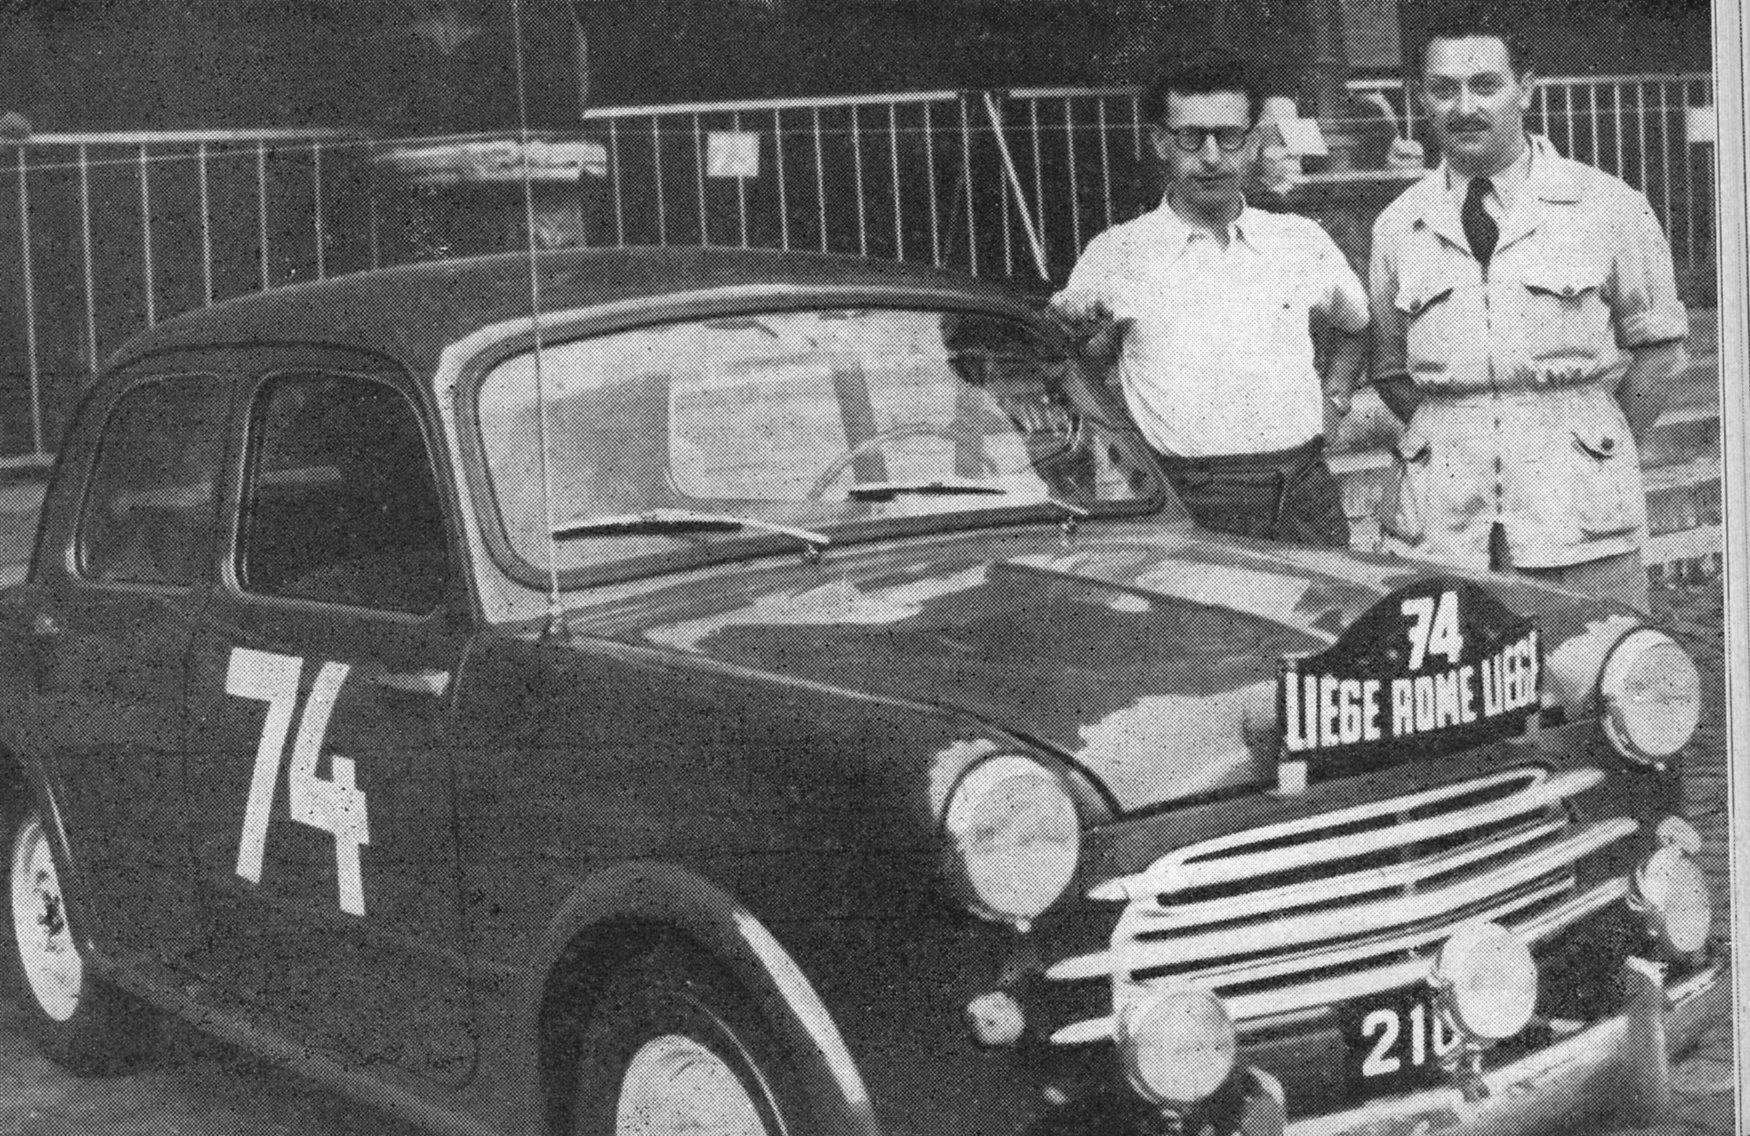 1953 Wagner H.-Radrizzi J. Liège-Rom-Liège    vor der Abfahrt in Liège